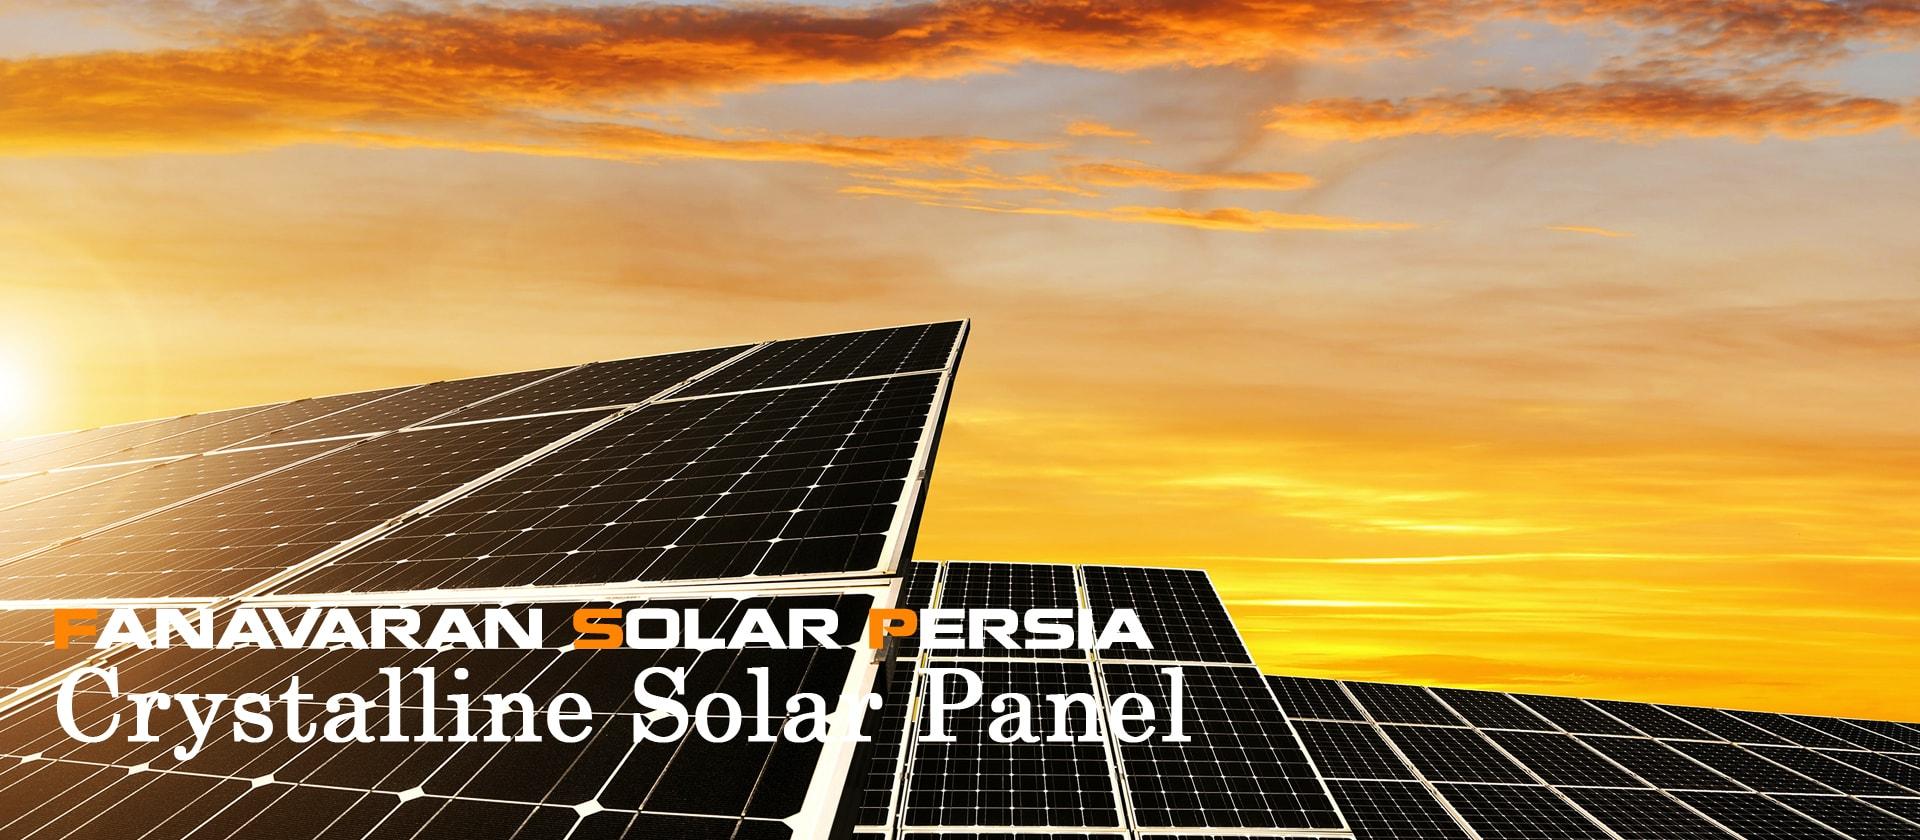 crystalline solar panel